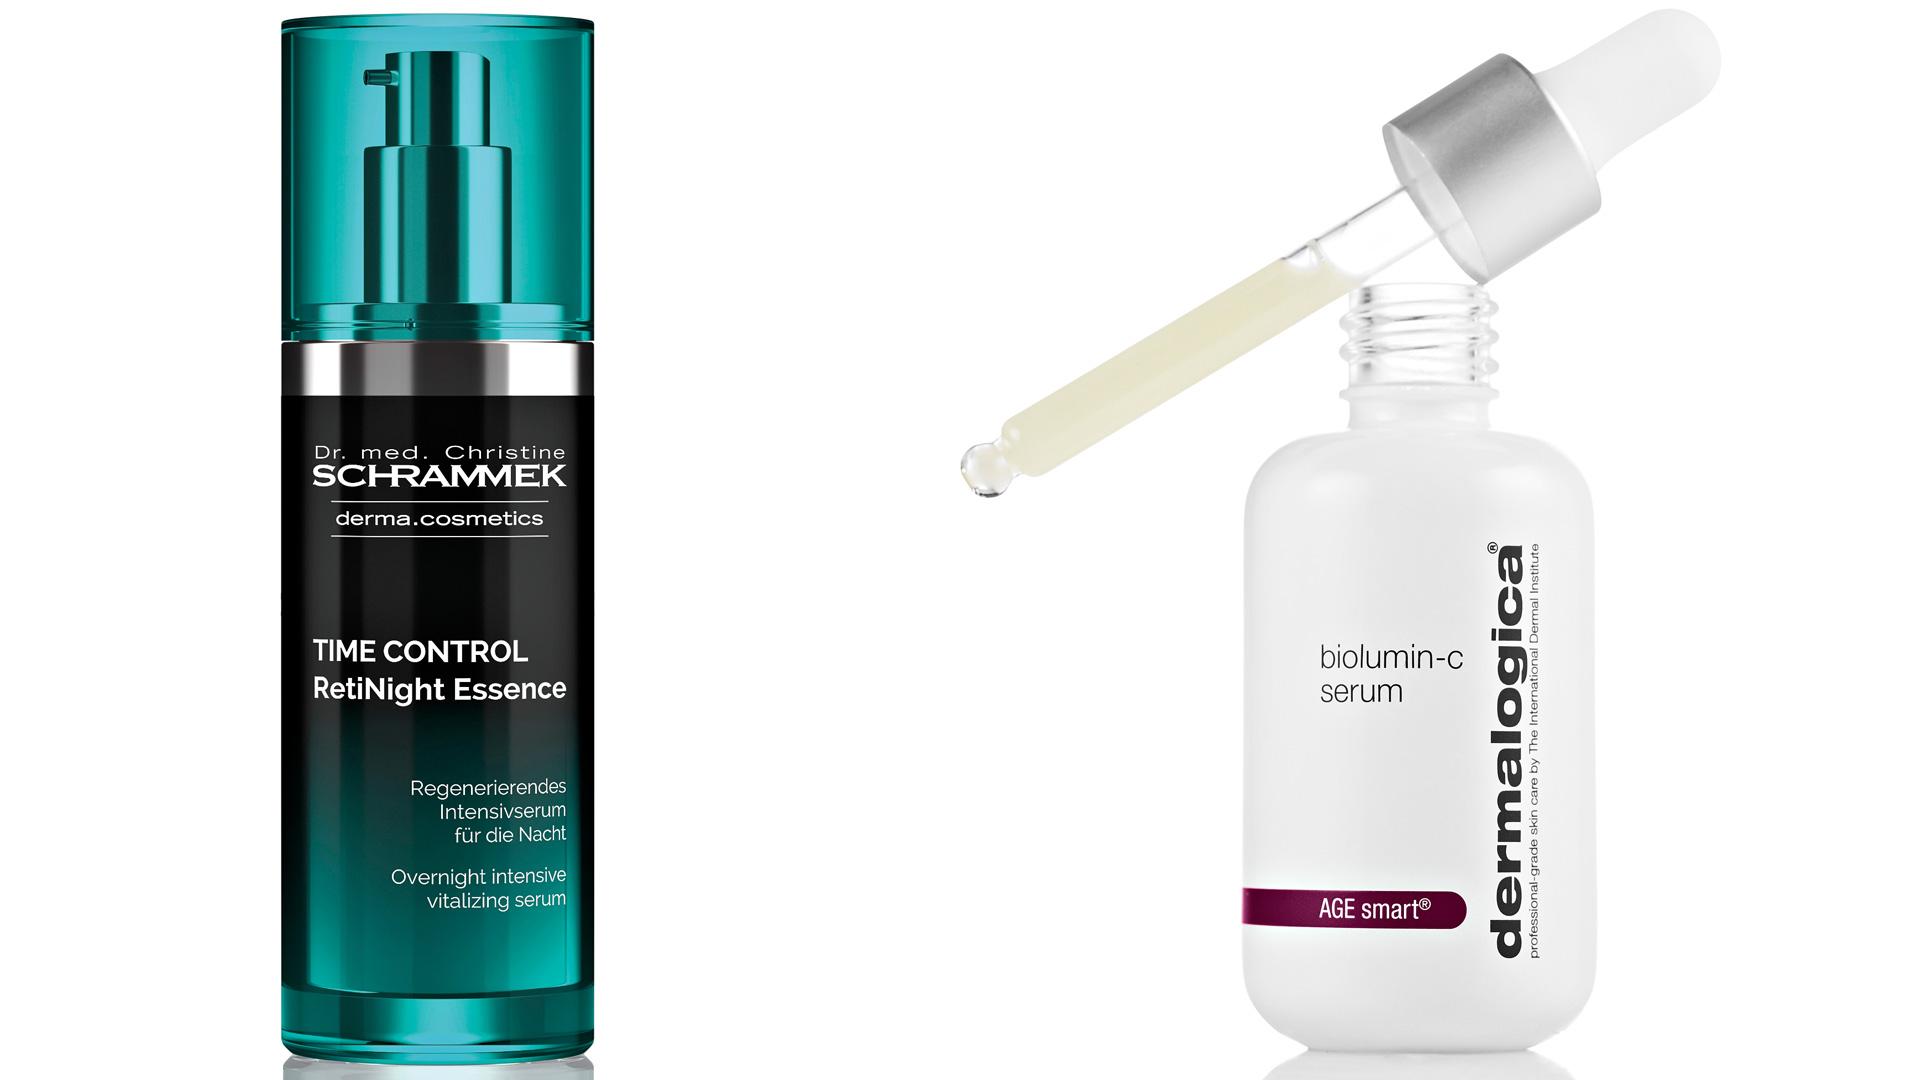 Dr Schrammek Time Control RetiNight Essence ja Dermalogica biolumin-c serum